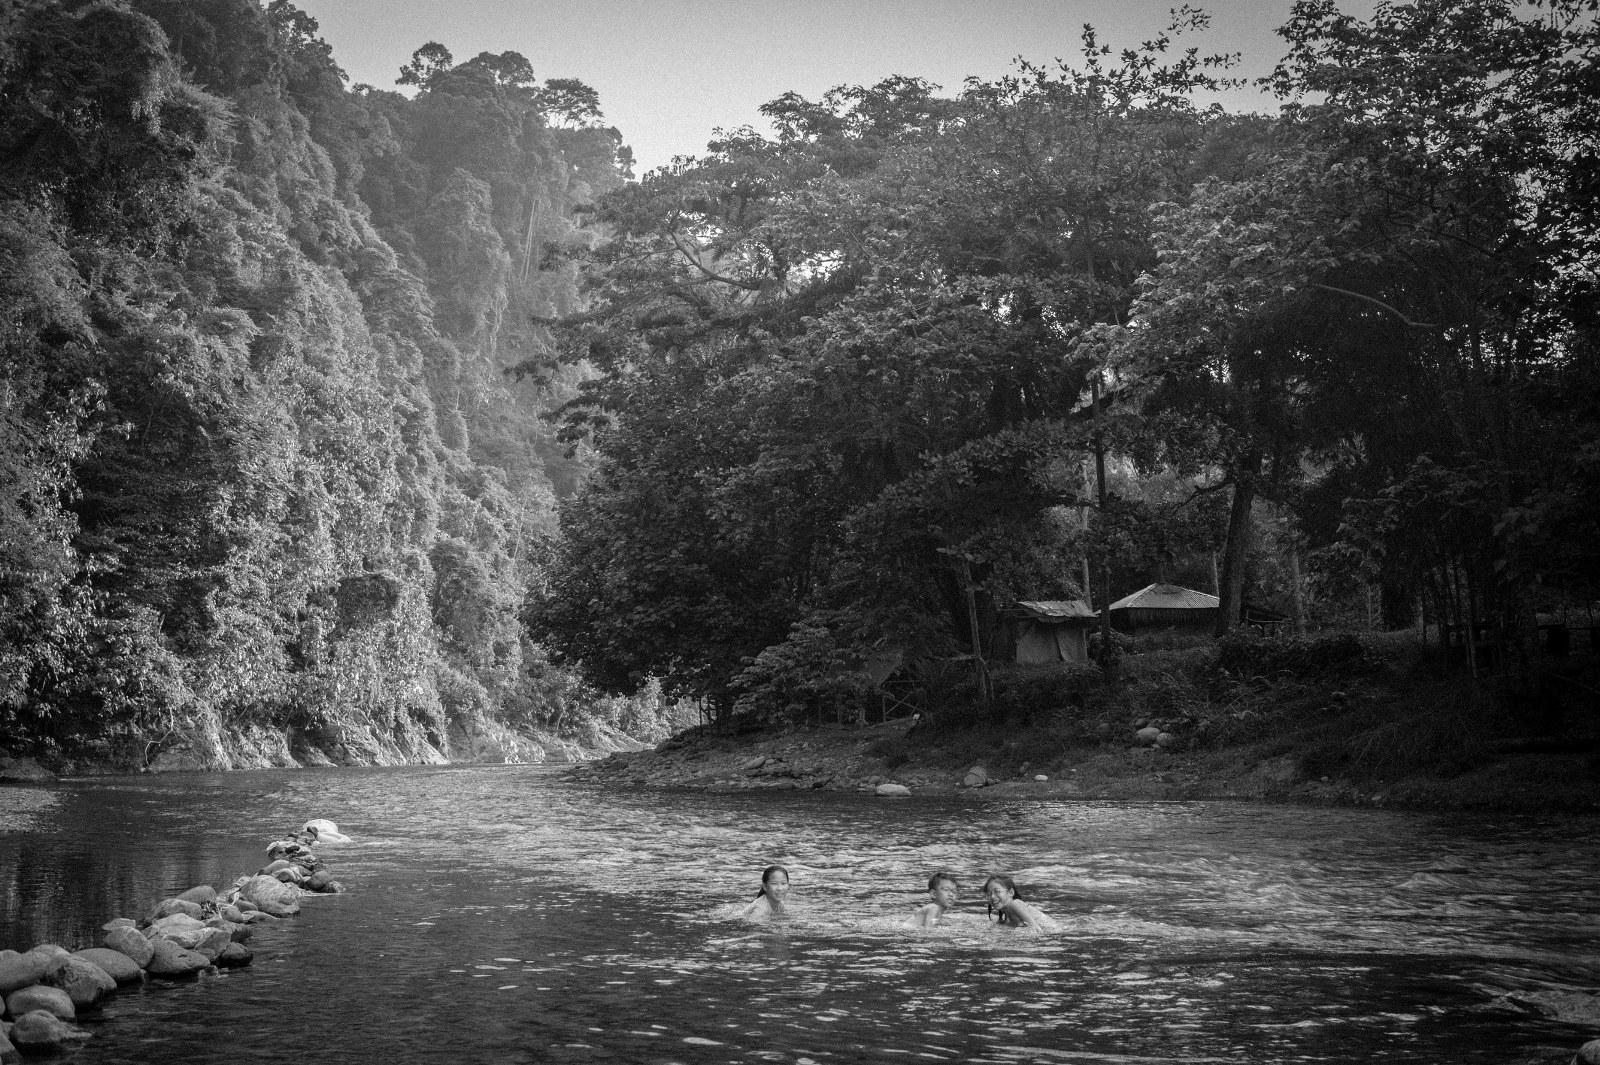 bukit-lawang-river-kids-1